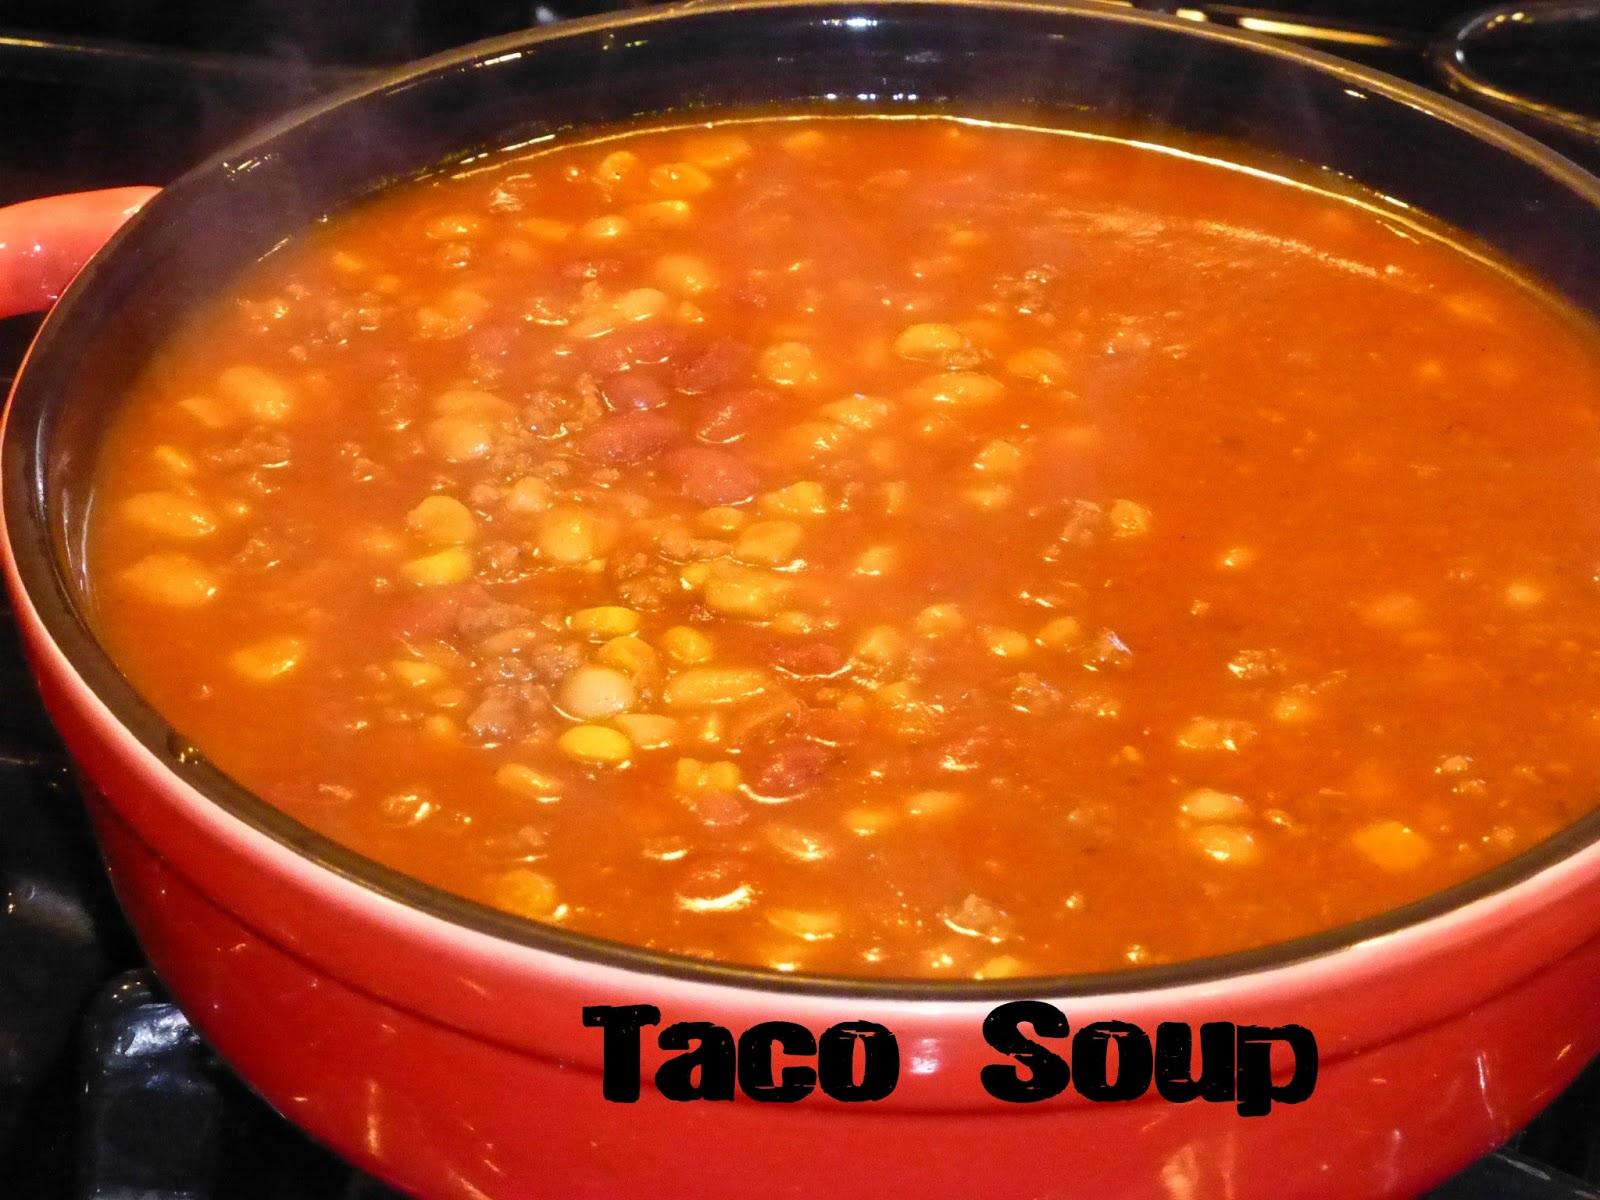 Taco Soup & Corn Cakes